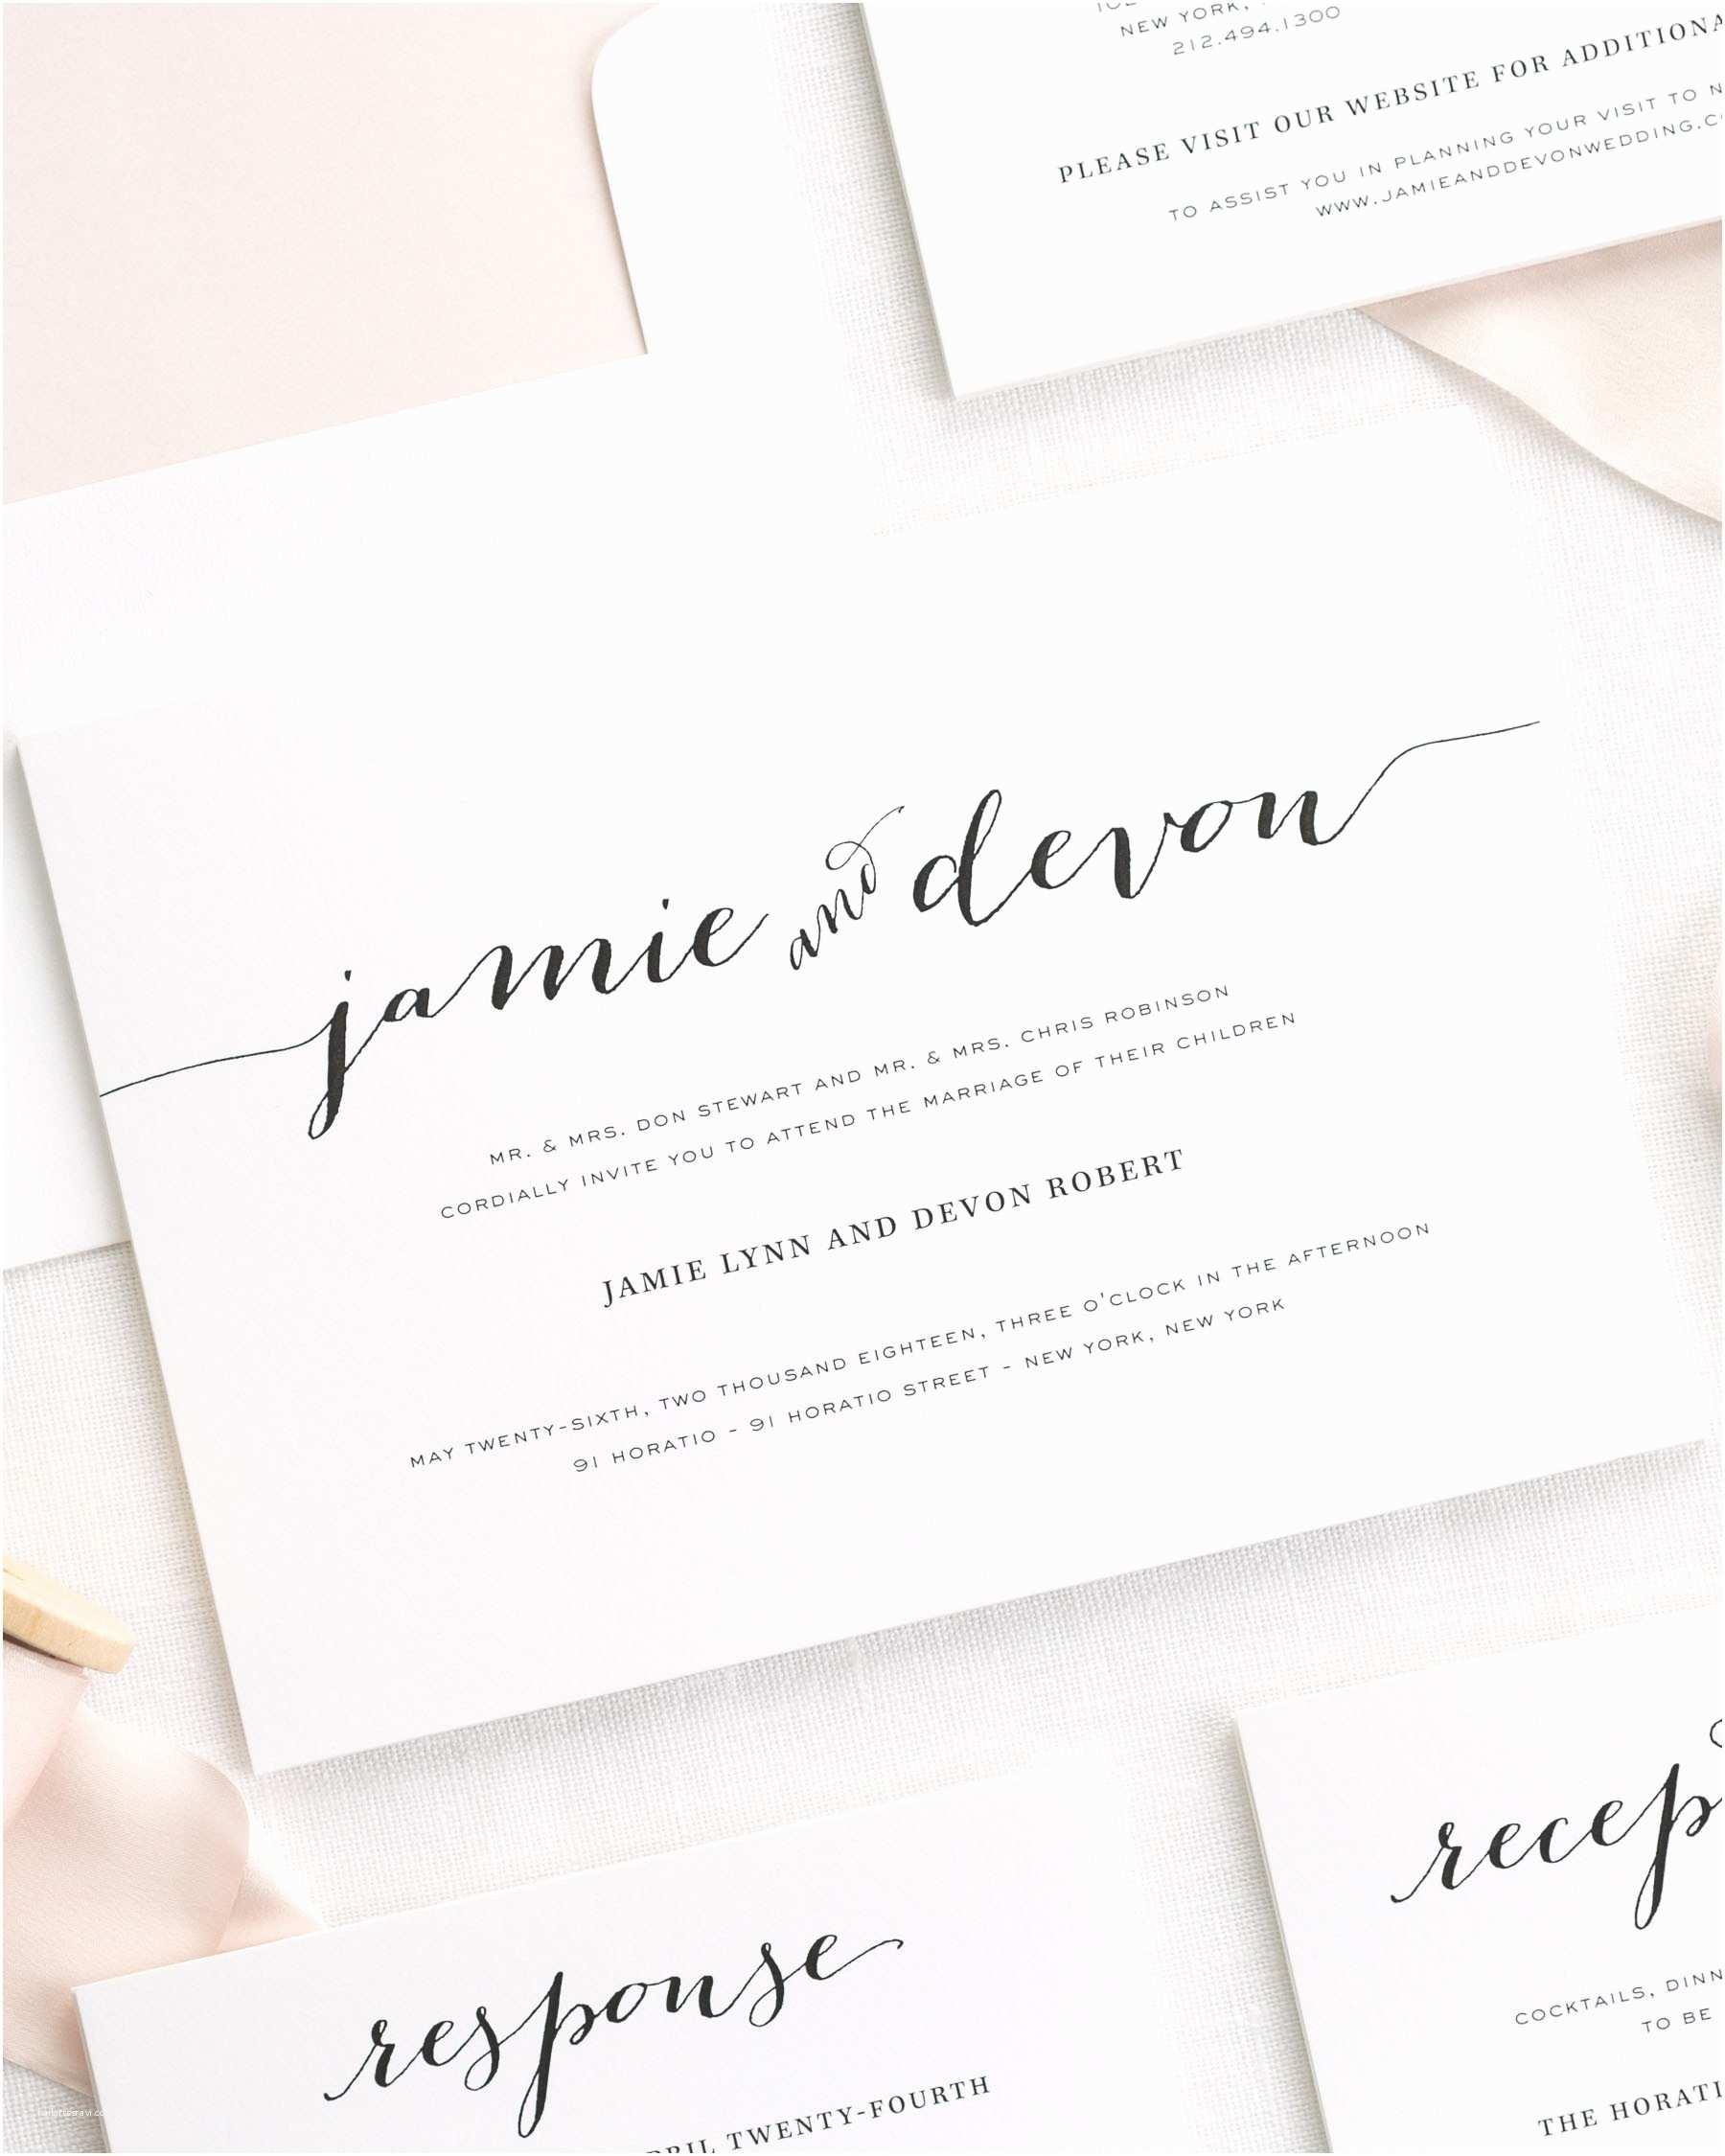 Wedding Invitation Sms Sample Wedding Invitation Sms Invitation Sample